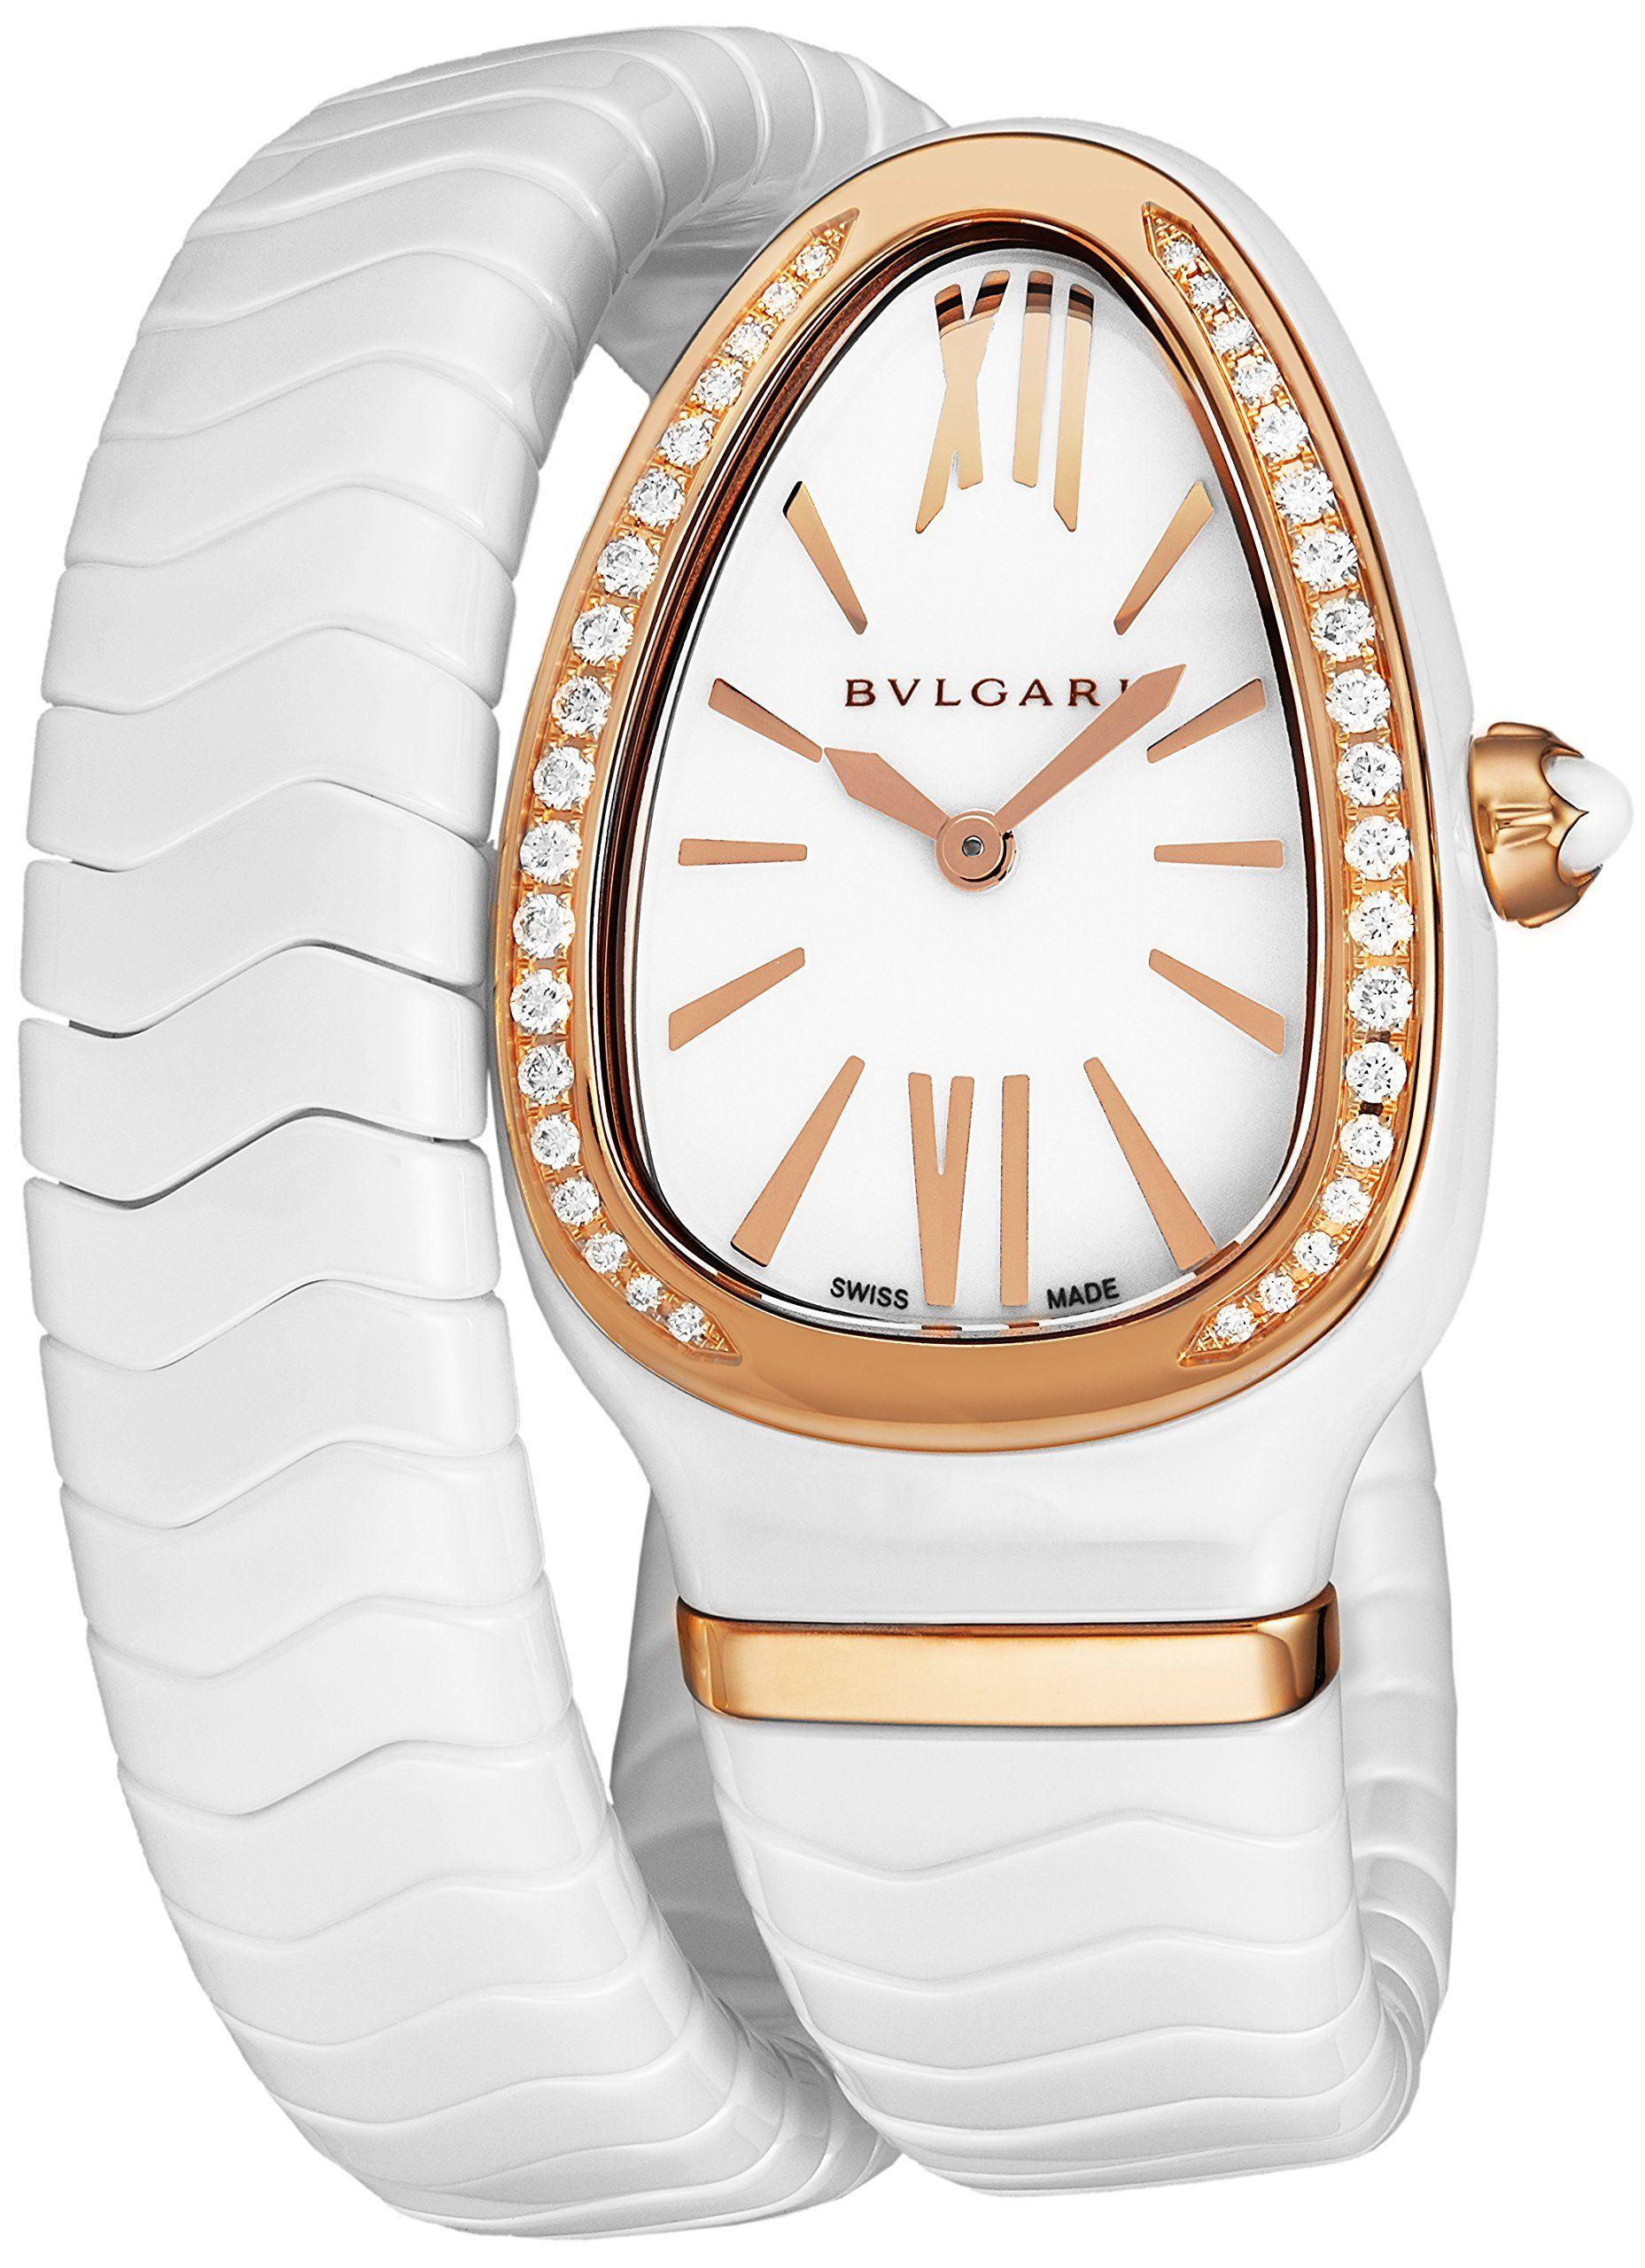 23de5f6925180 Bulgari Serpenti Spiga Womens White Ceramic Rose Gold Diamond Watch -  Triangle Analog White Face with Sapphire Crystal Snake-shape Ladies Watch -  Swiss ...